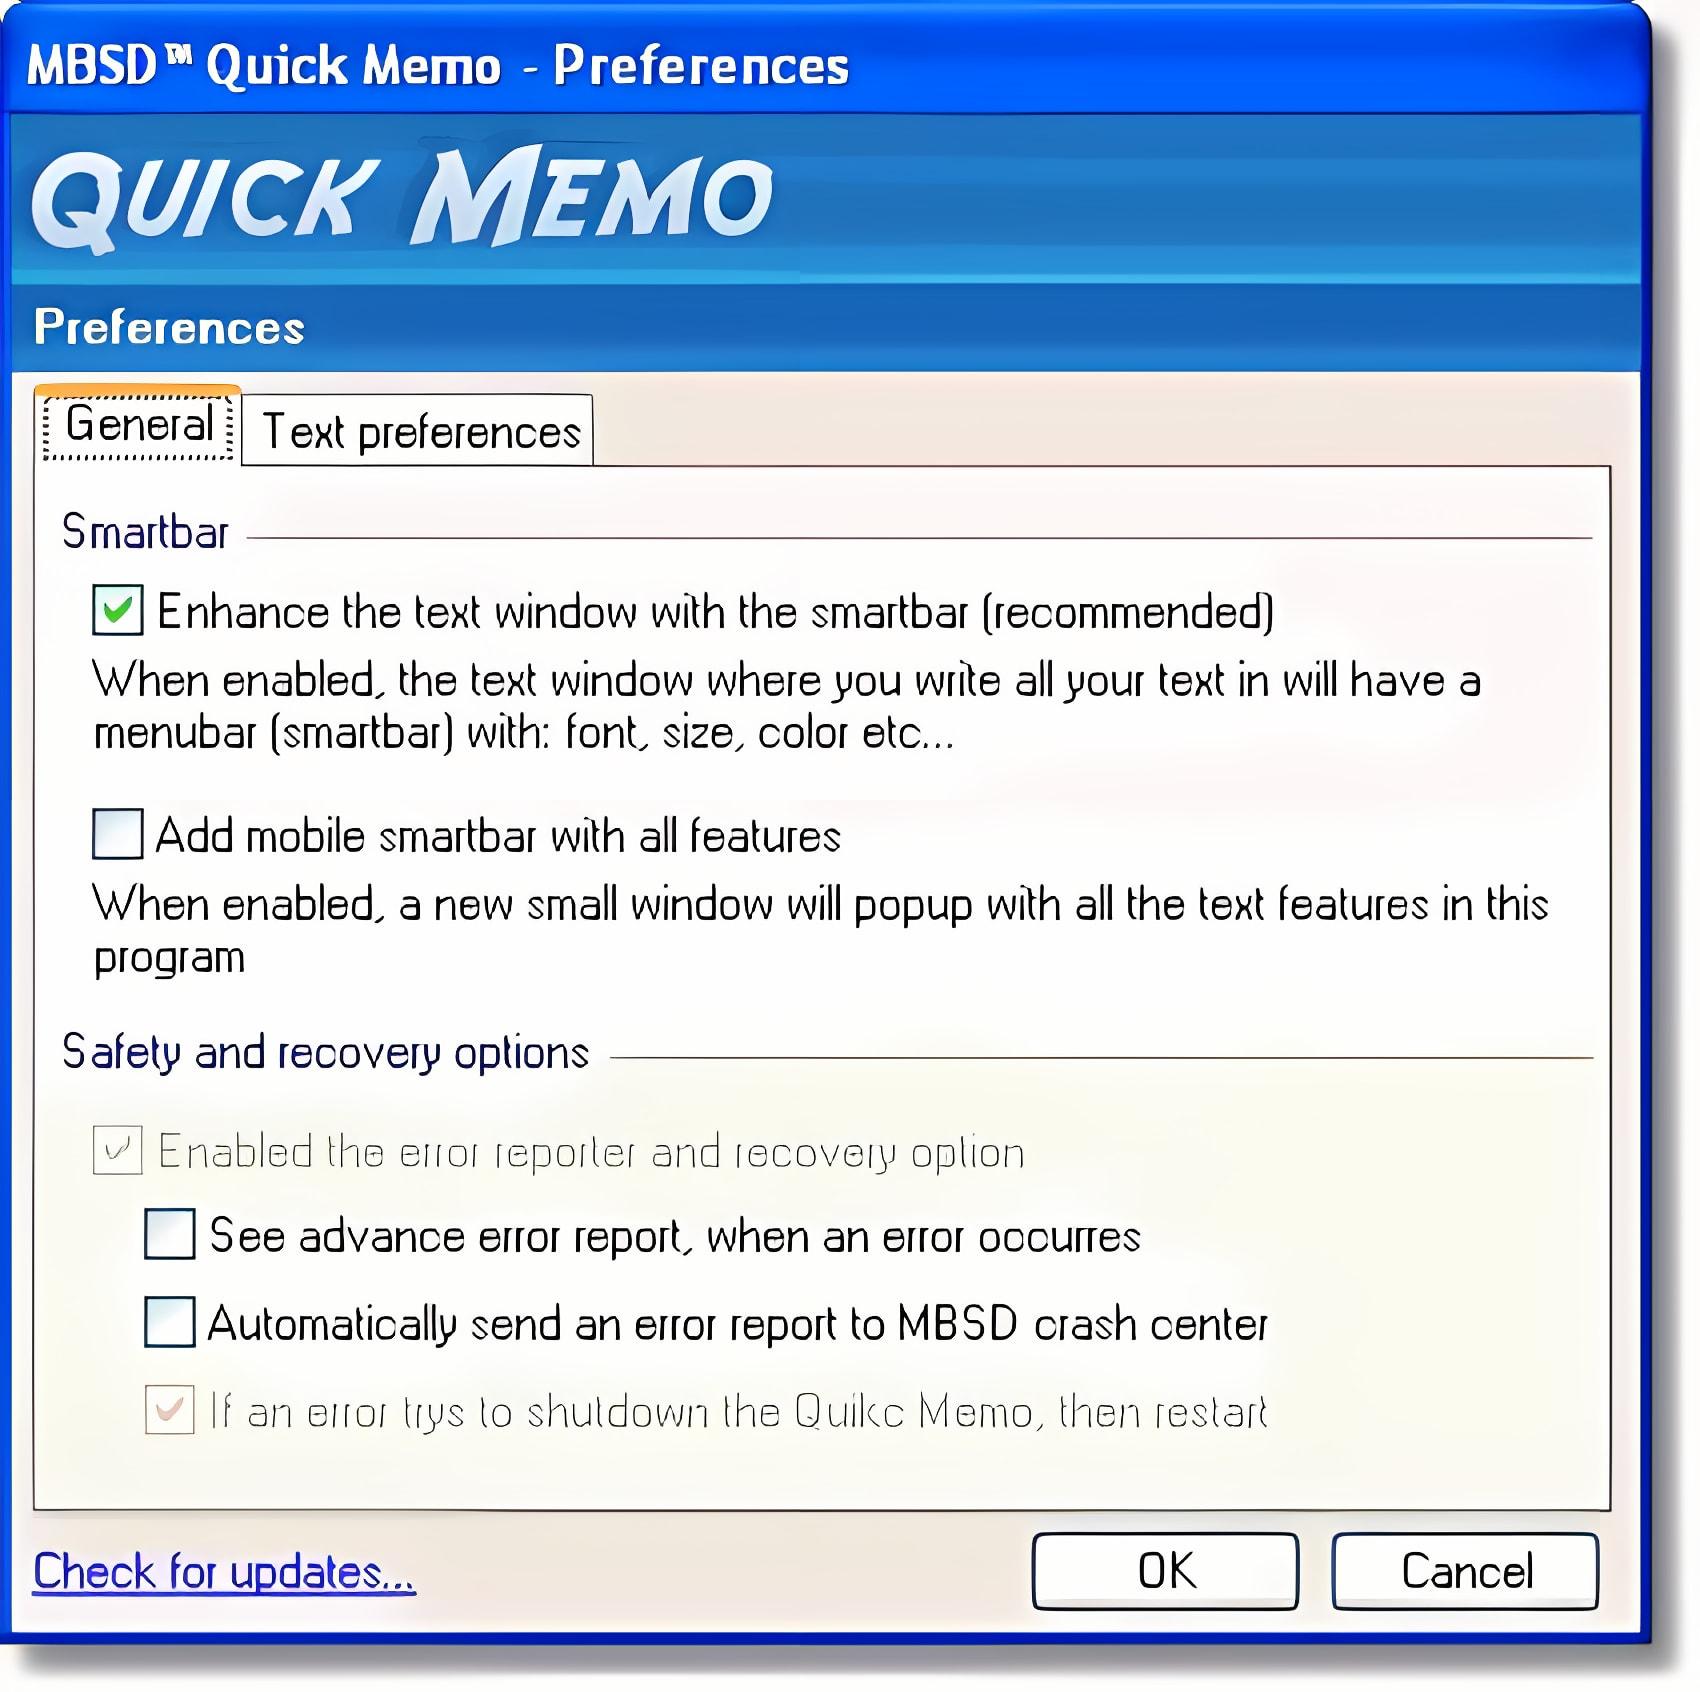 MBSD Quick Memo